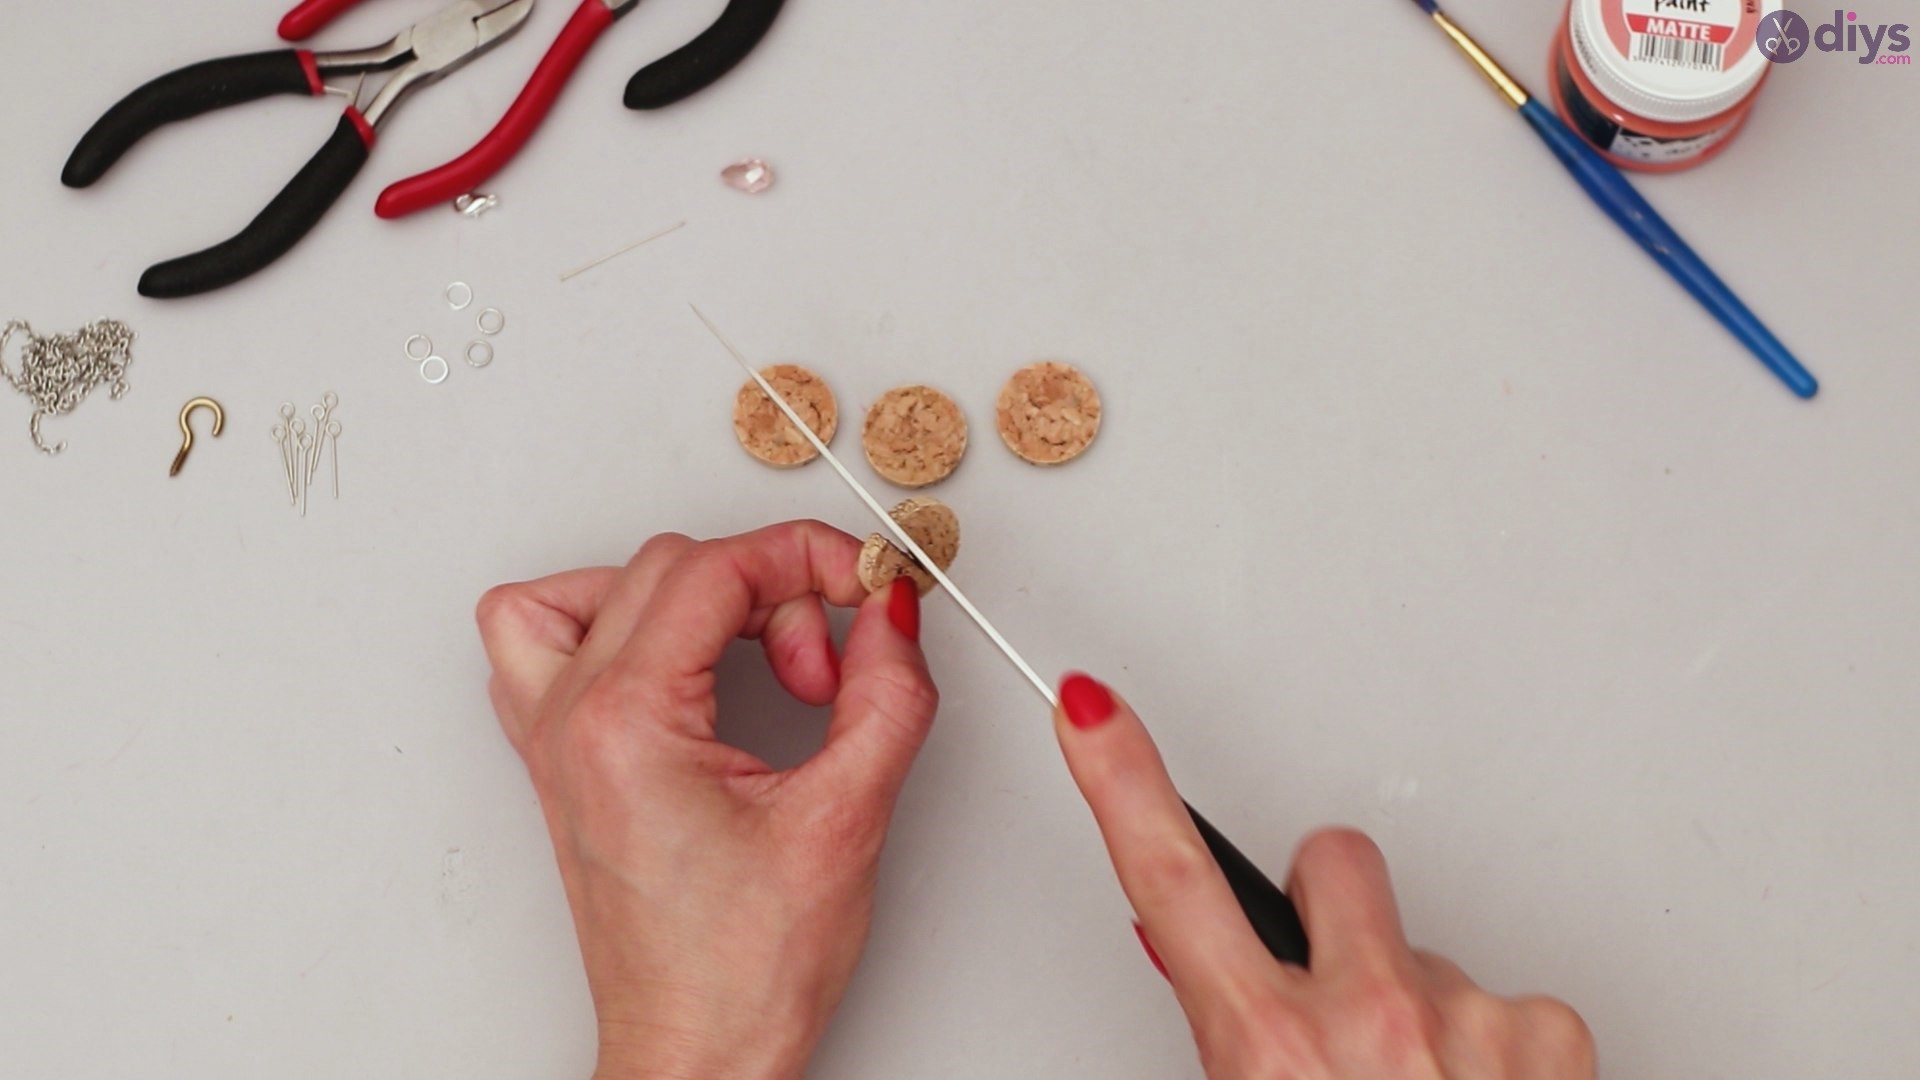 Diy wine cork necklace (4)